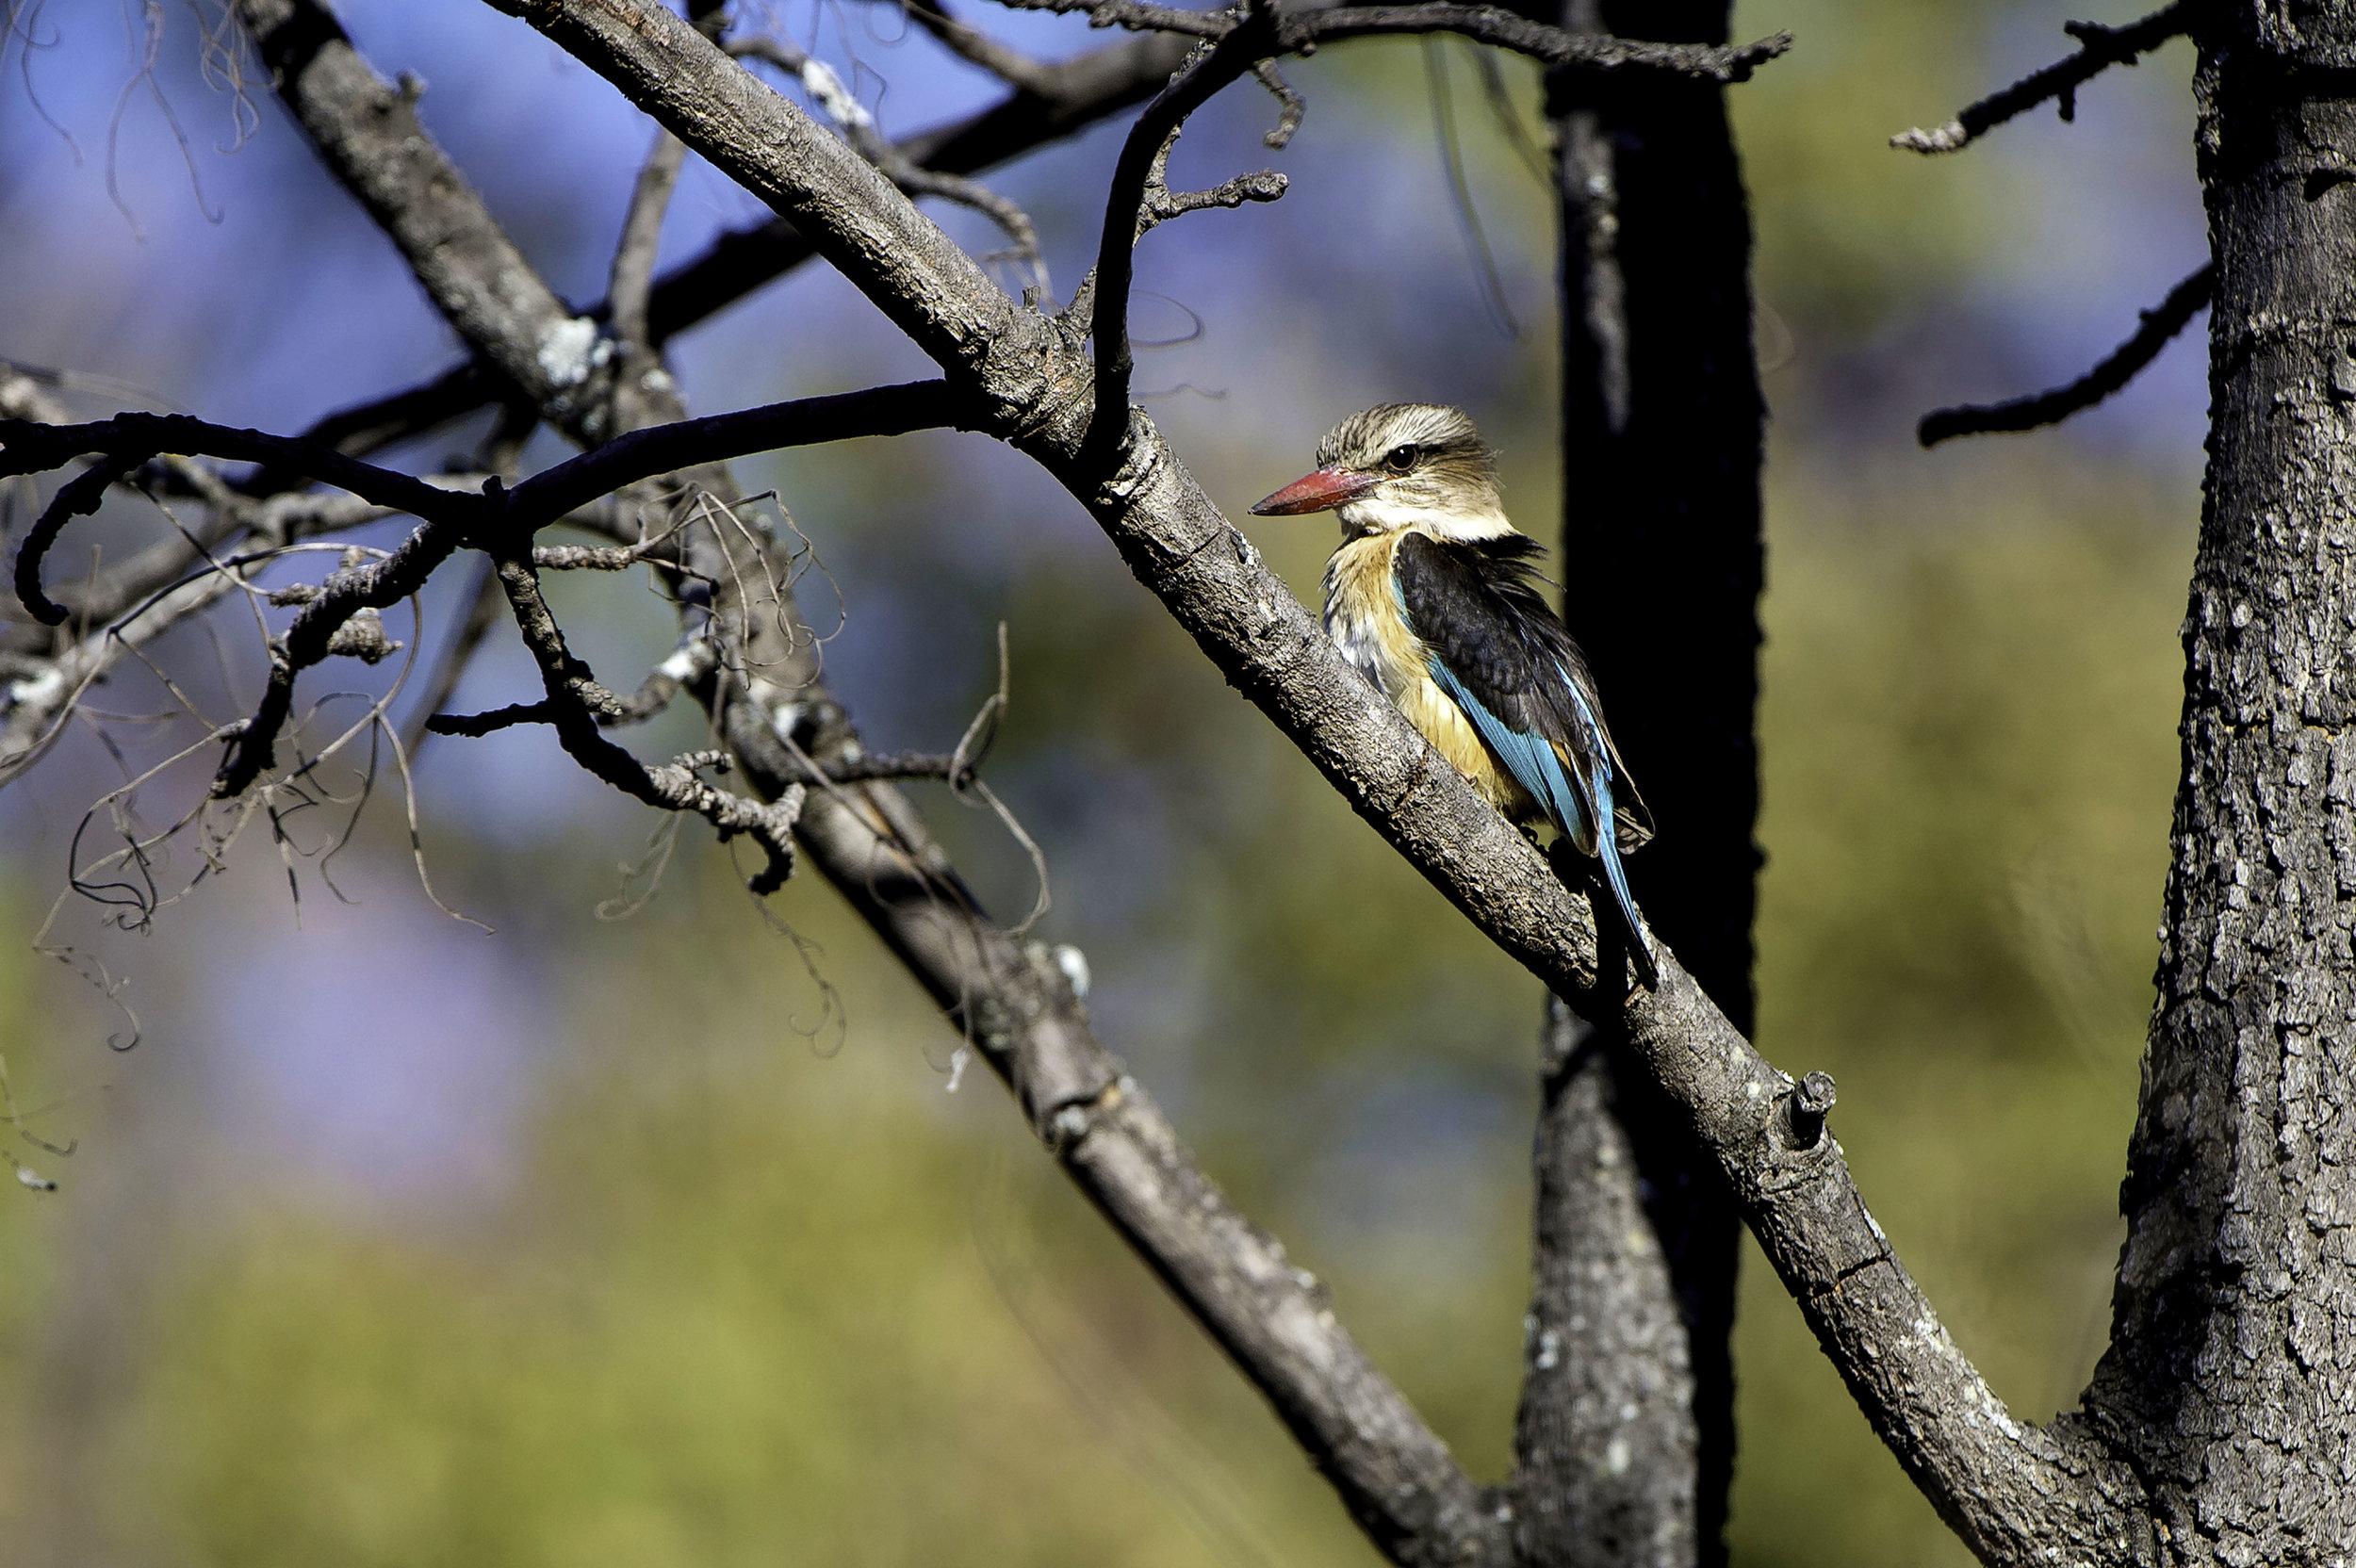 Rare Earth_Welgevonden_Bird_06.jpg